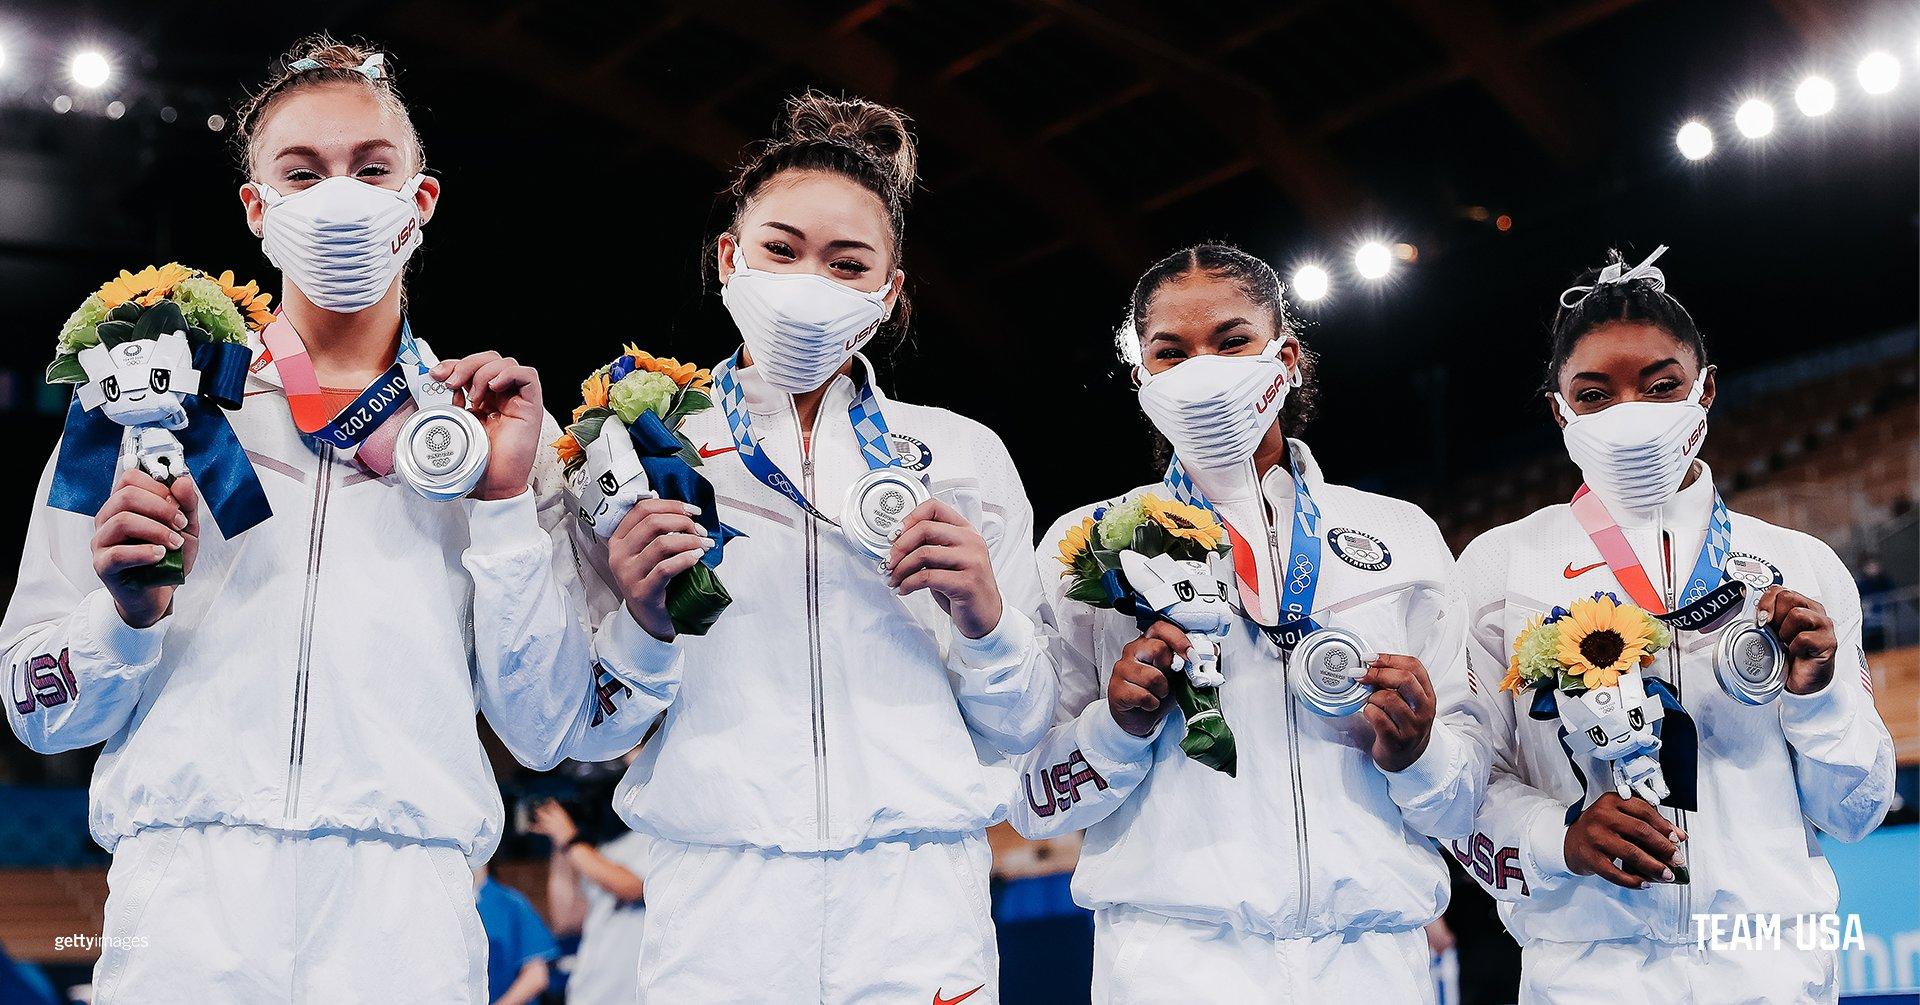 suni lee w silver medal